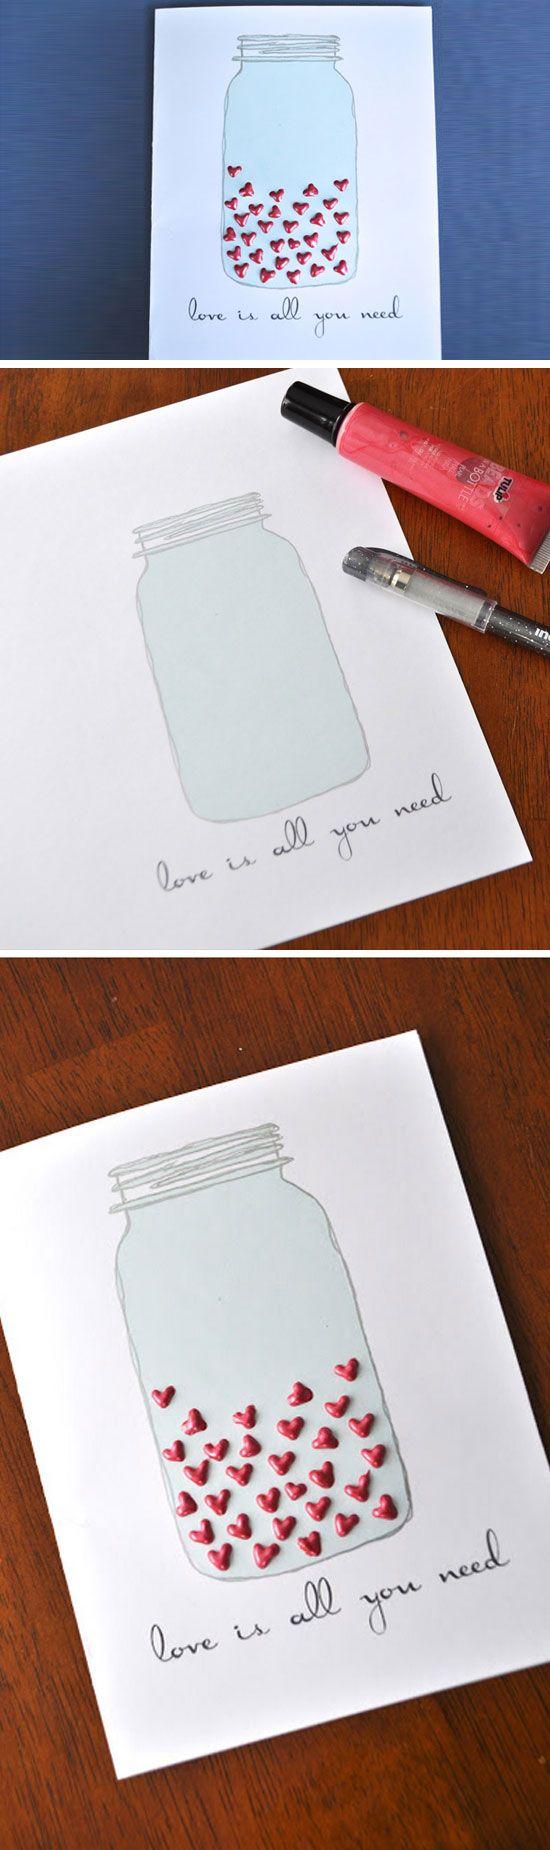 25 best ideas about Diy valentines cards – What to Write in Boyfriends Valentines Card